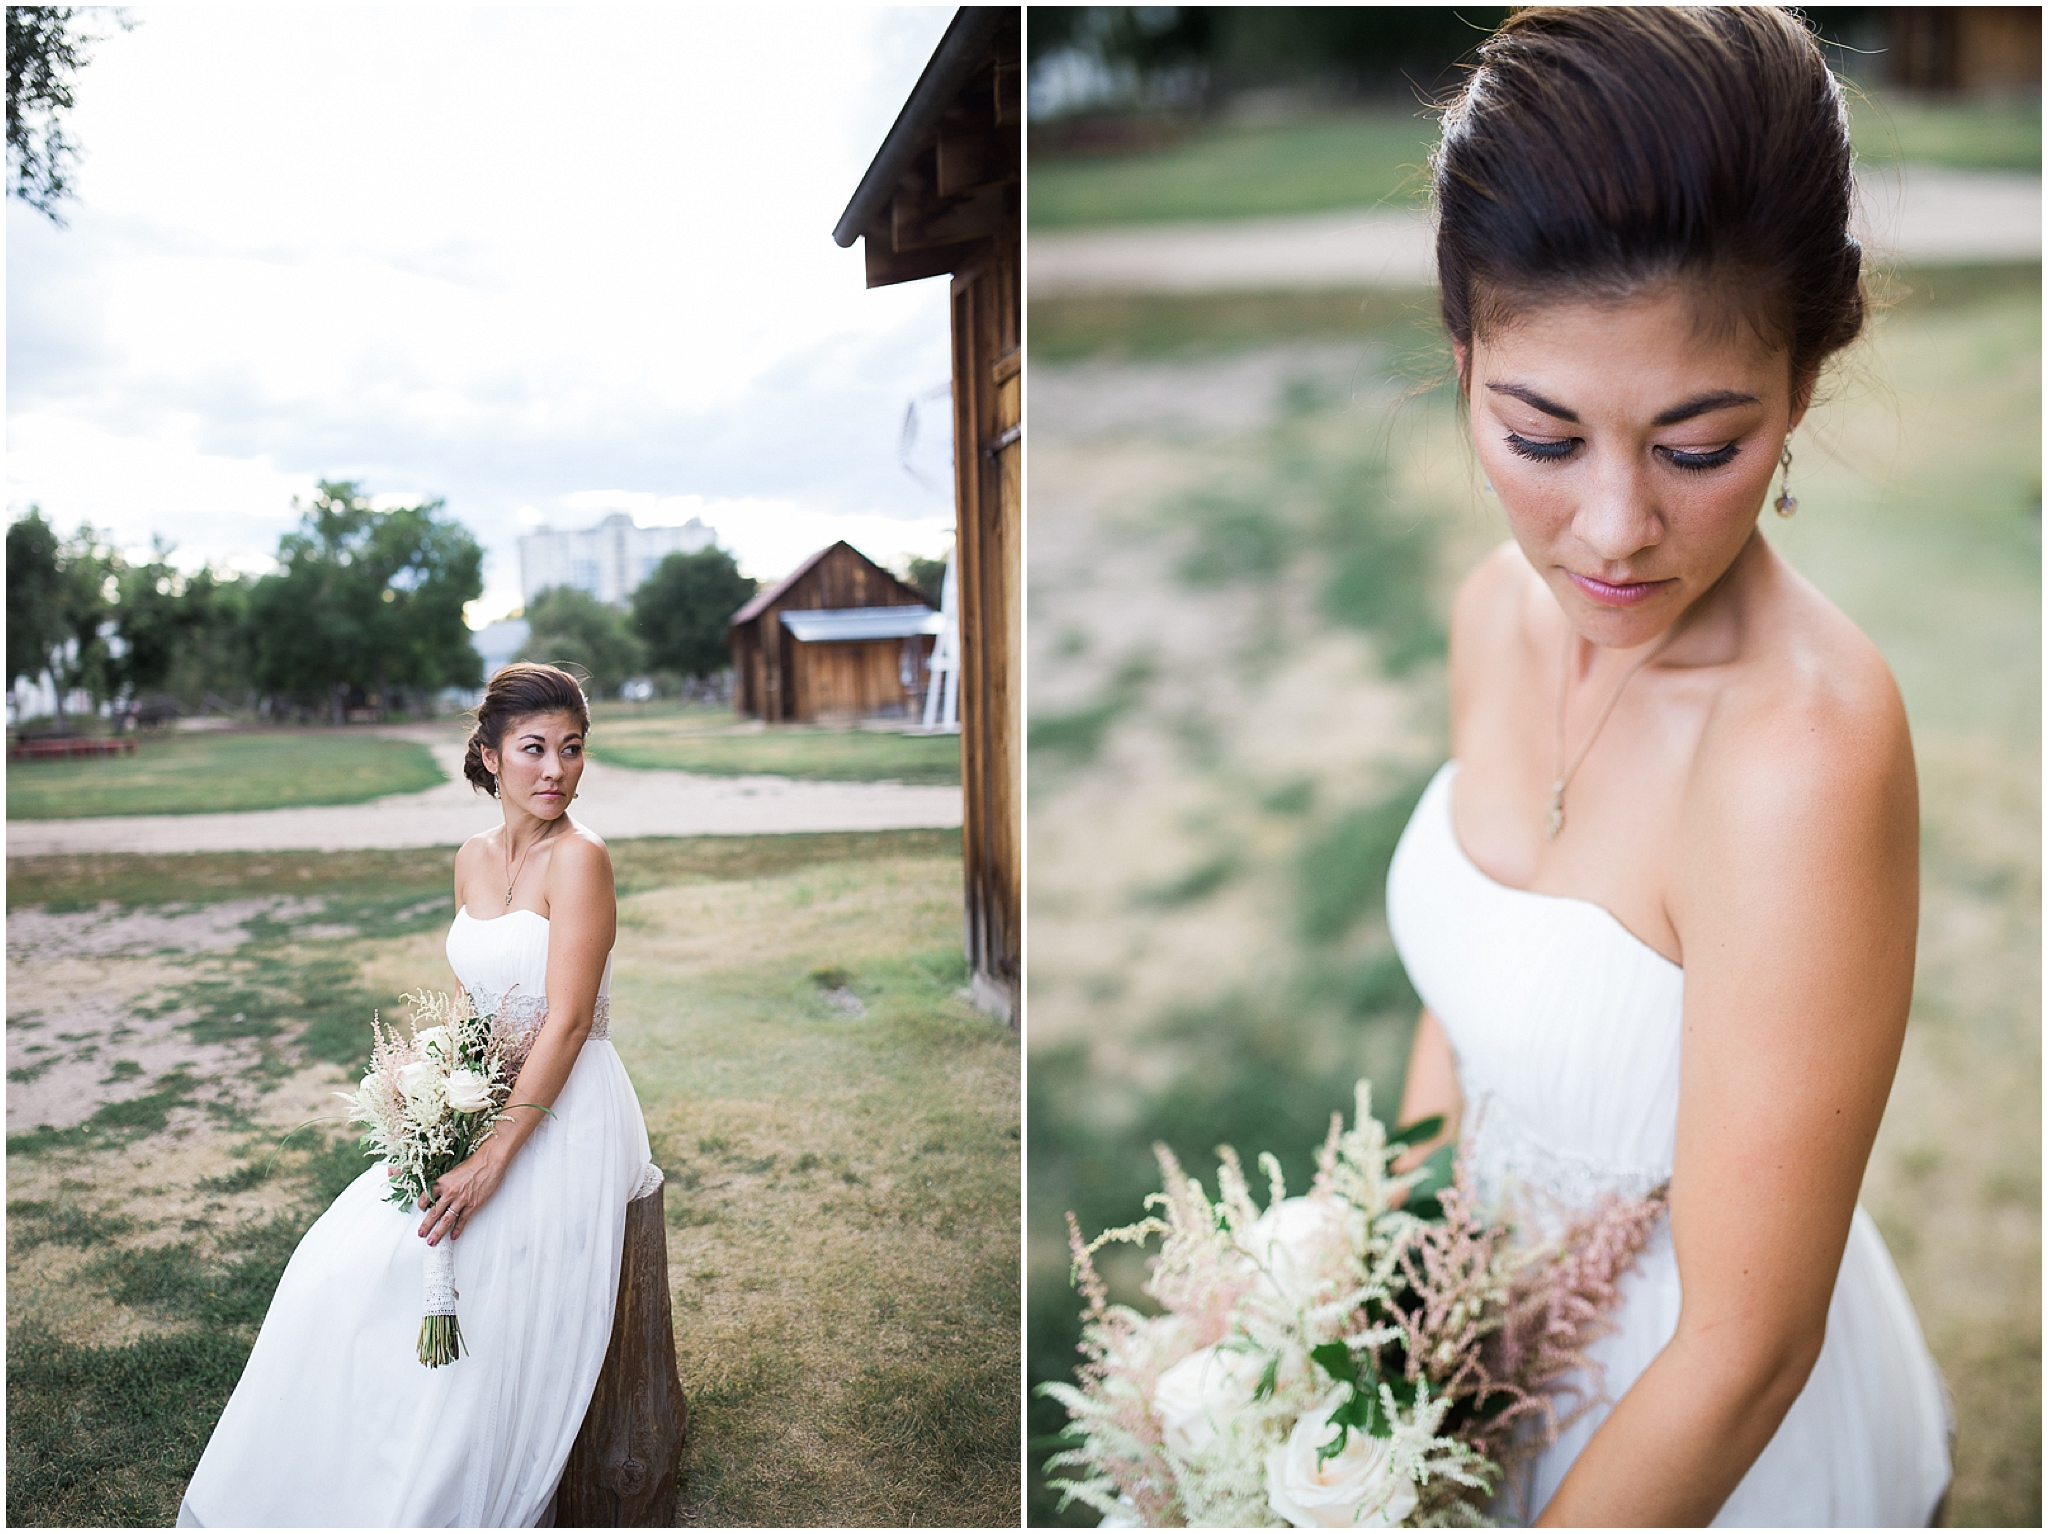 Bride at fourmile historic park wedding